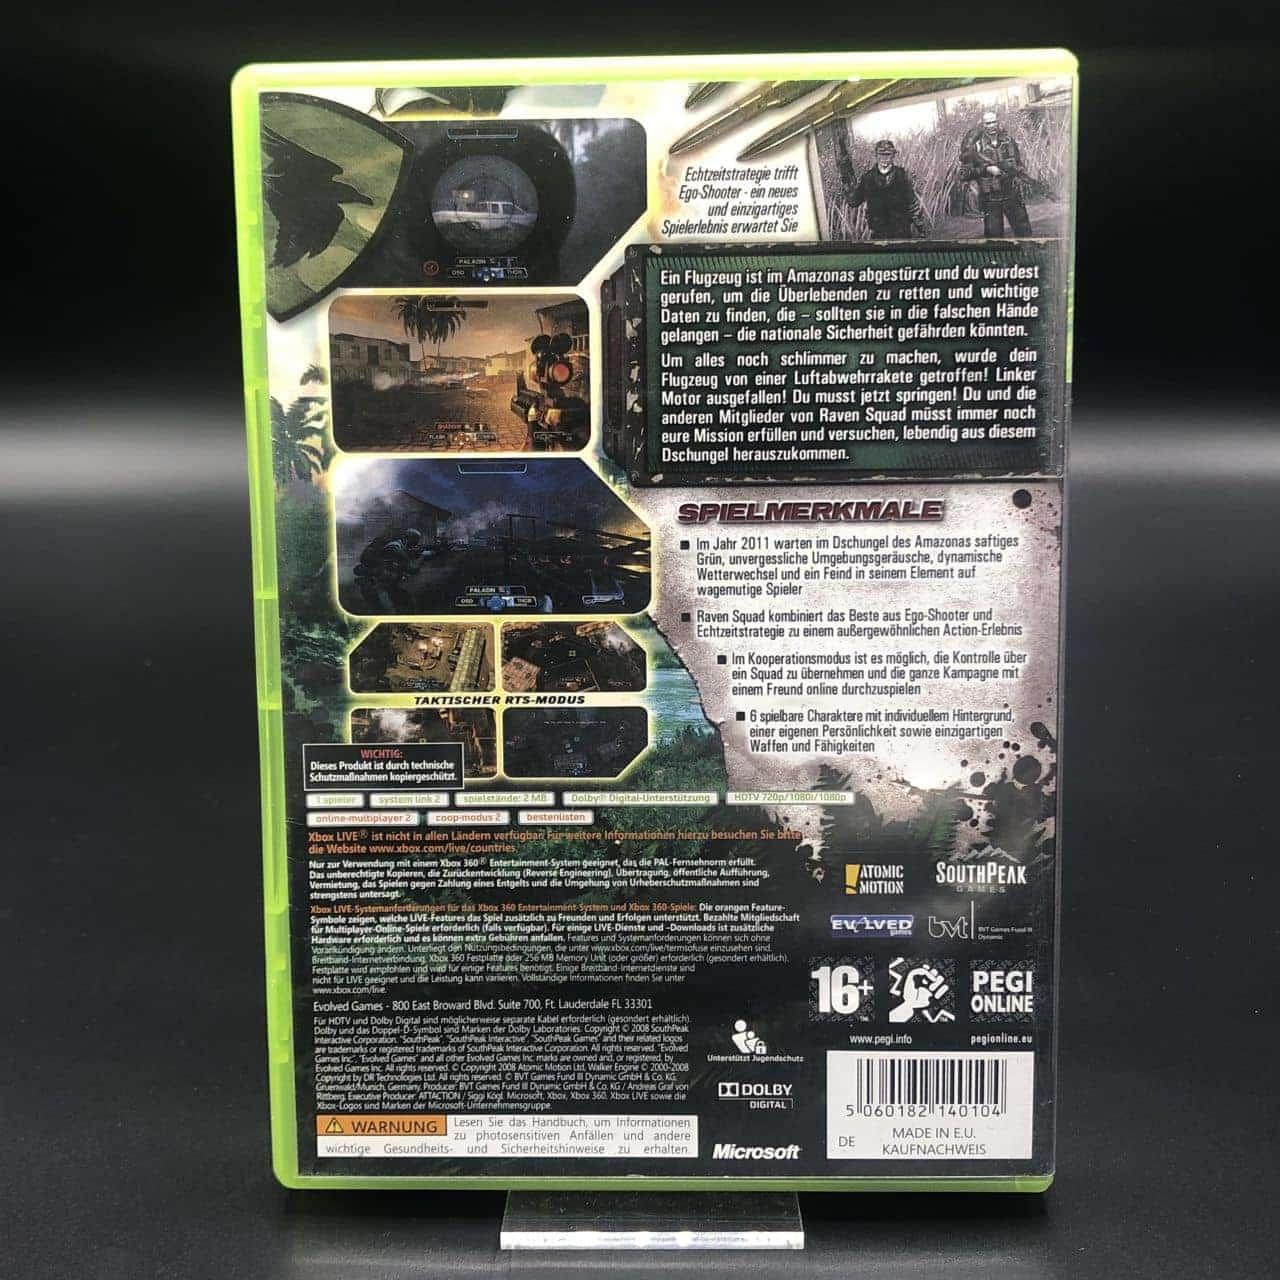 Raven Squad: Operation Hidden Dagger (Komplett) (Sehr gut) Microsoft XBOX 360 (FSK18)